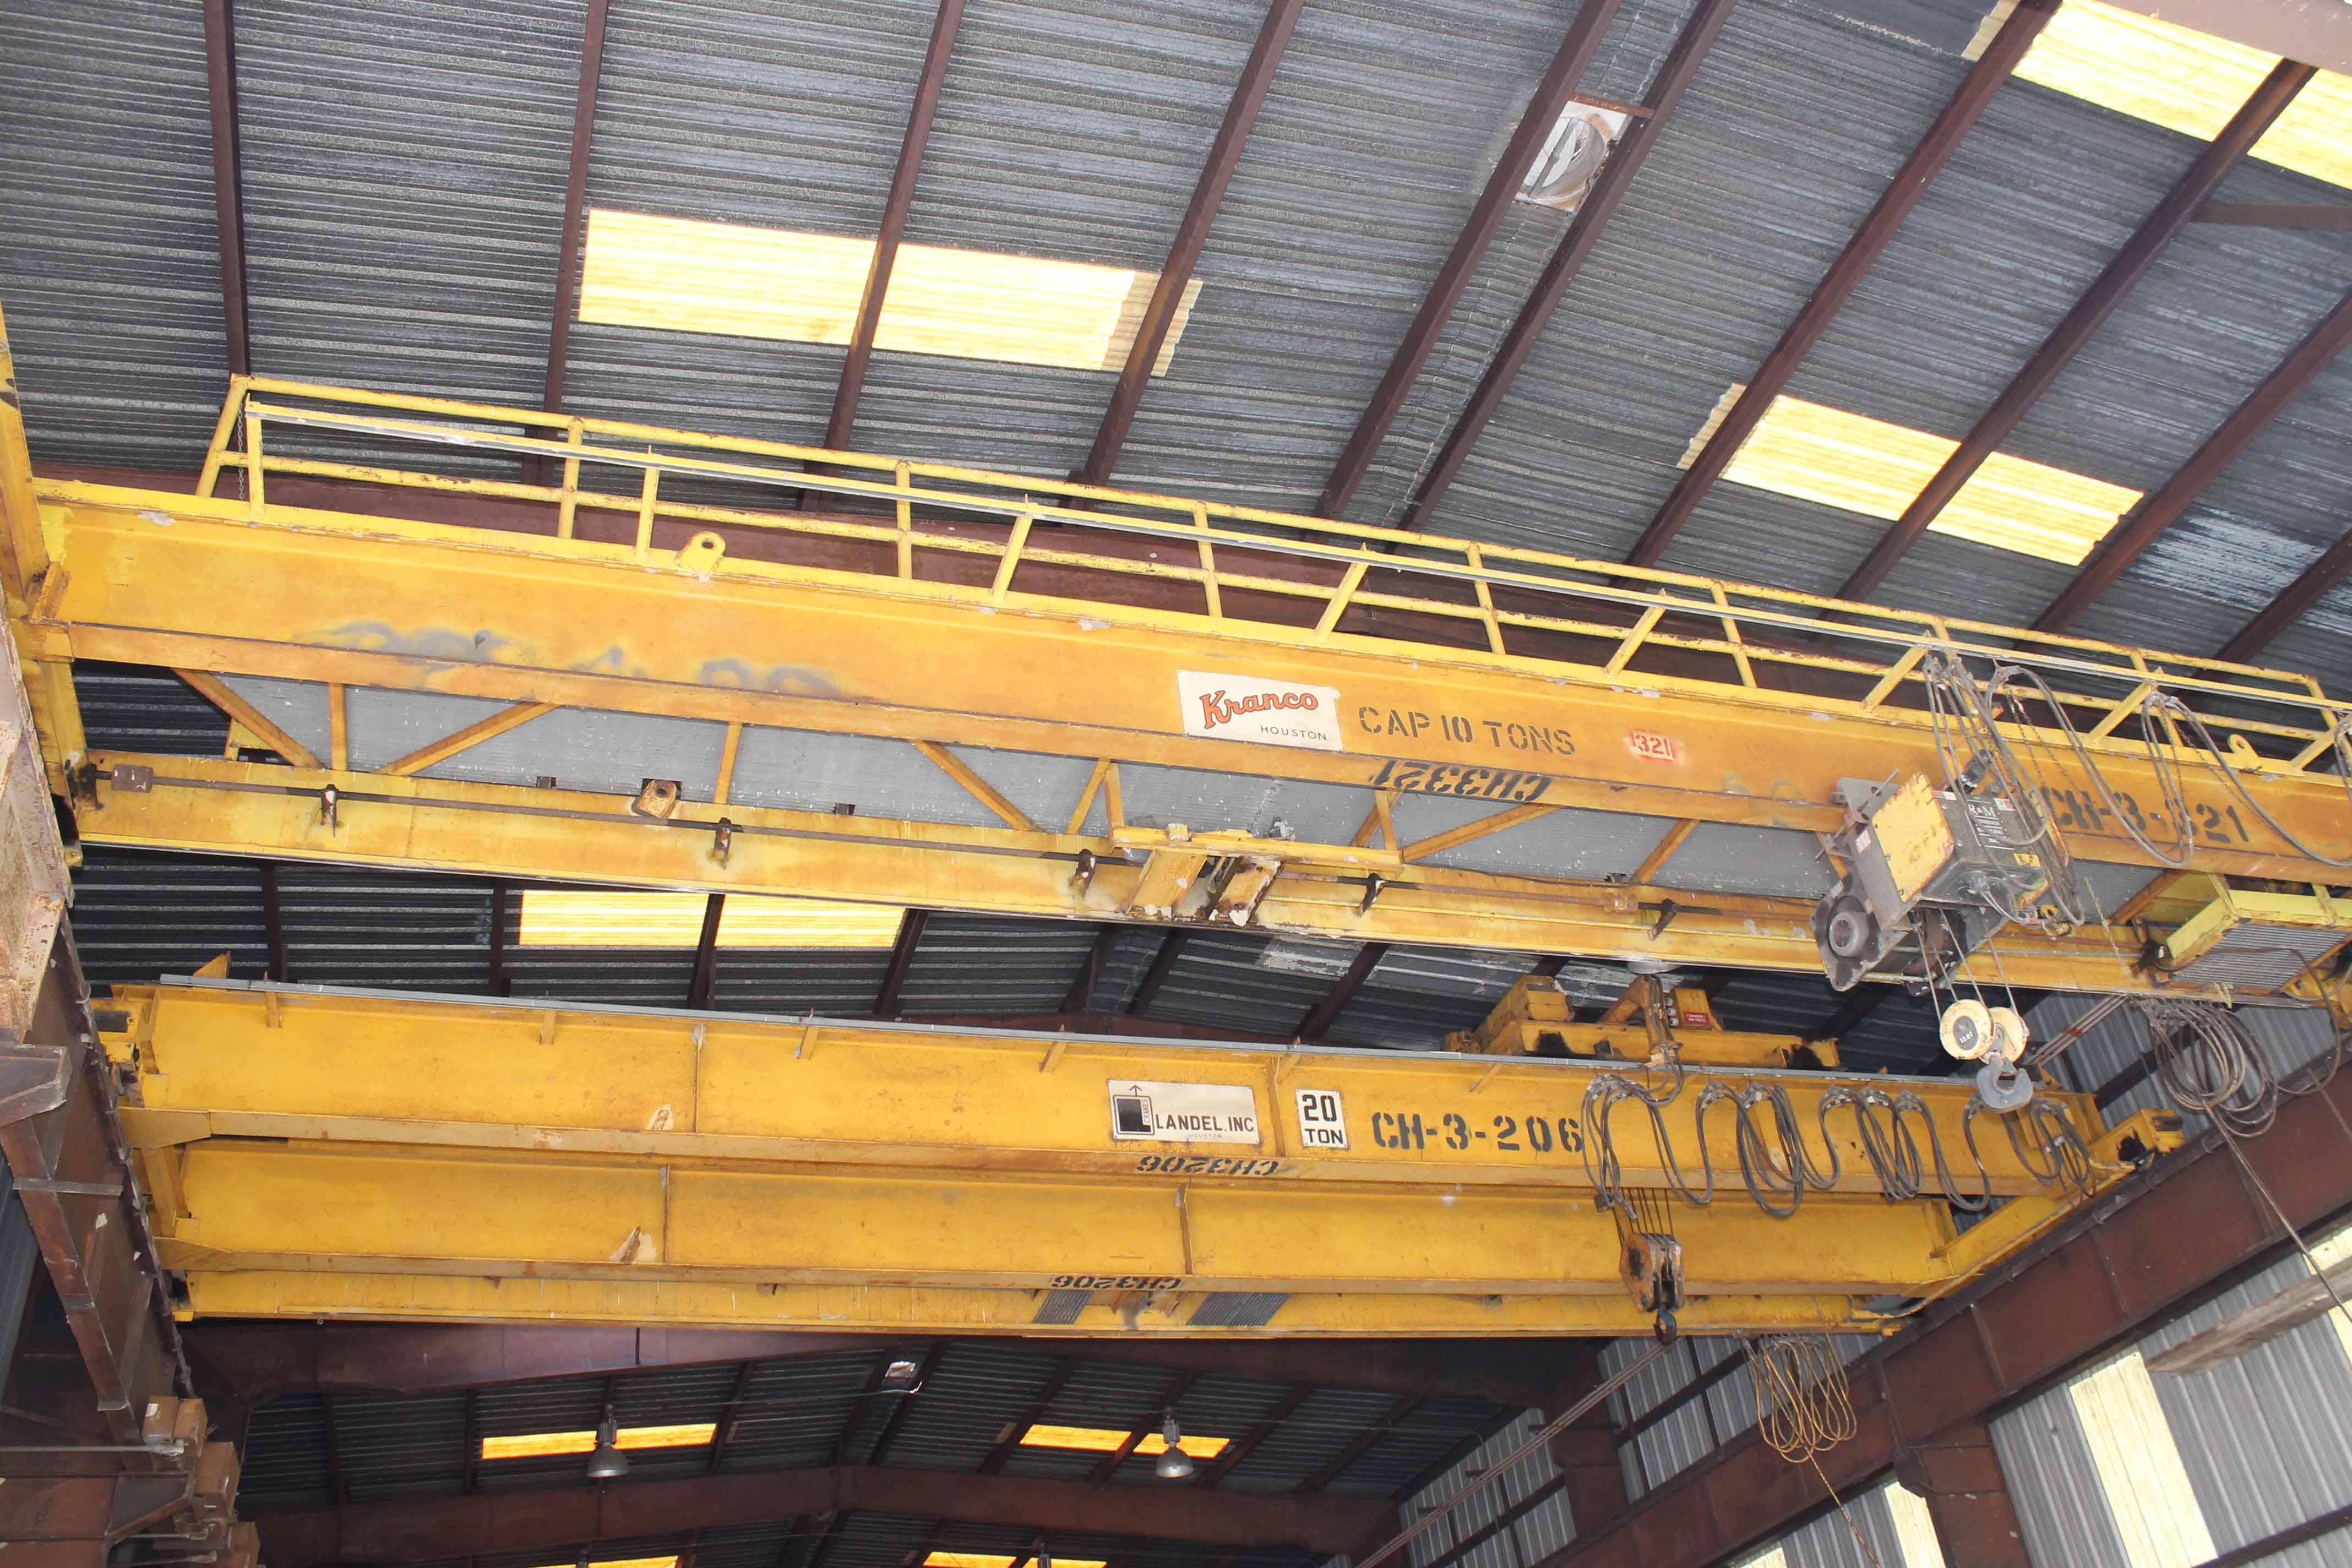 "Lot 21 - Overhead Bridge Crane, Kranco 10 ton x 44'-7-1/2"" span, single girder, top riding bridge, underslung"